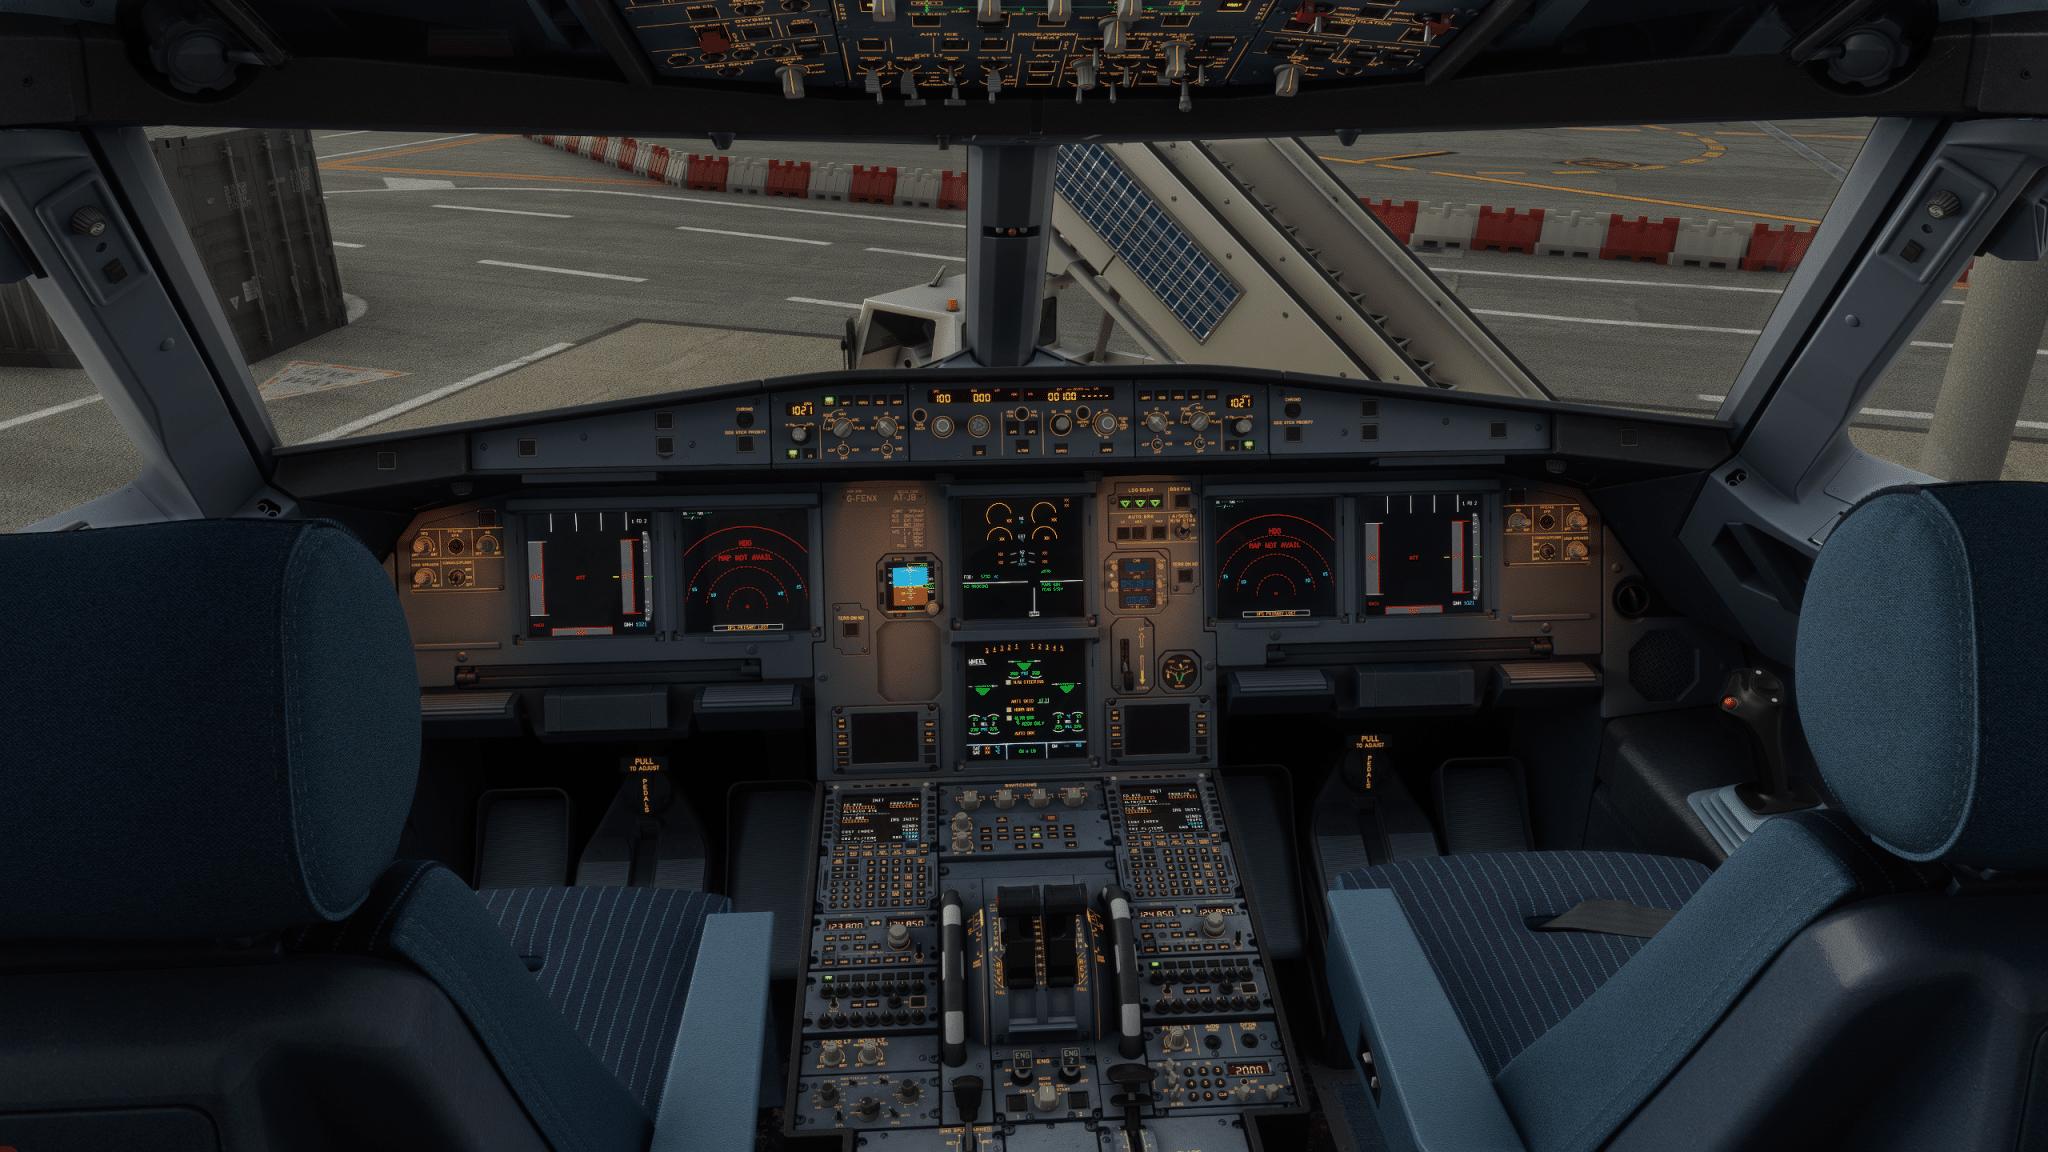 Microsoft-Flight-Simulator-Screenshot-2021.07.12-05.19.15.15-2048x1152